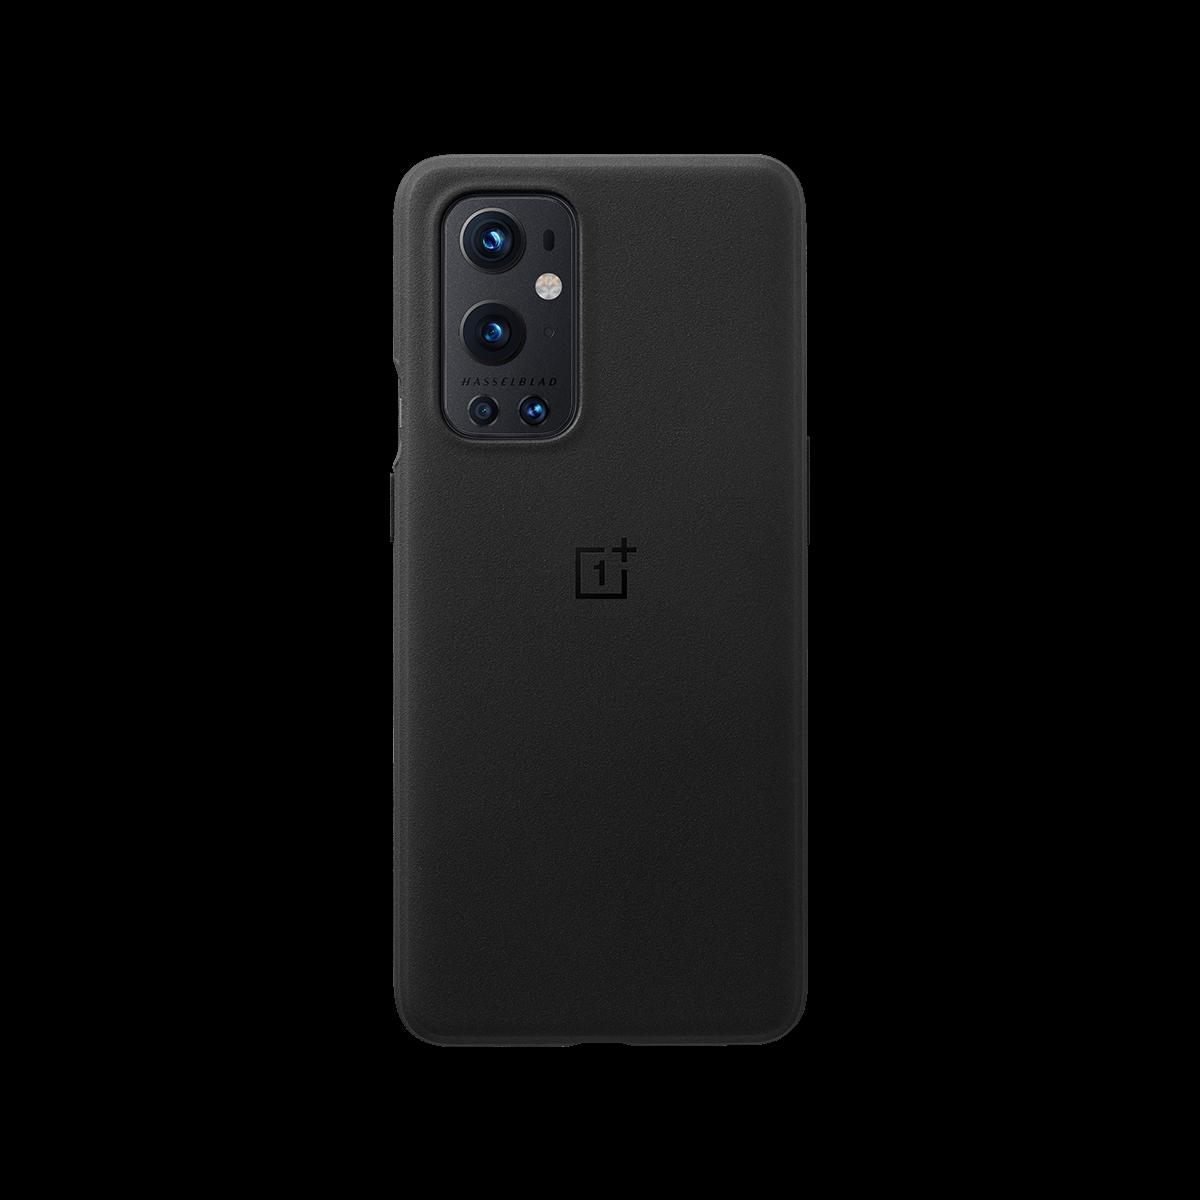 OnePlus 9 Pro Sandstone Bumper Case Sandstone Black